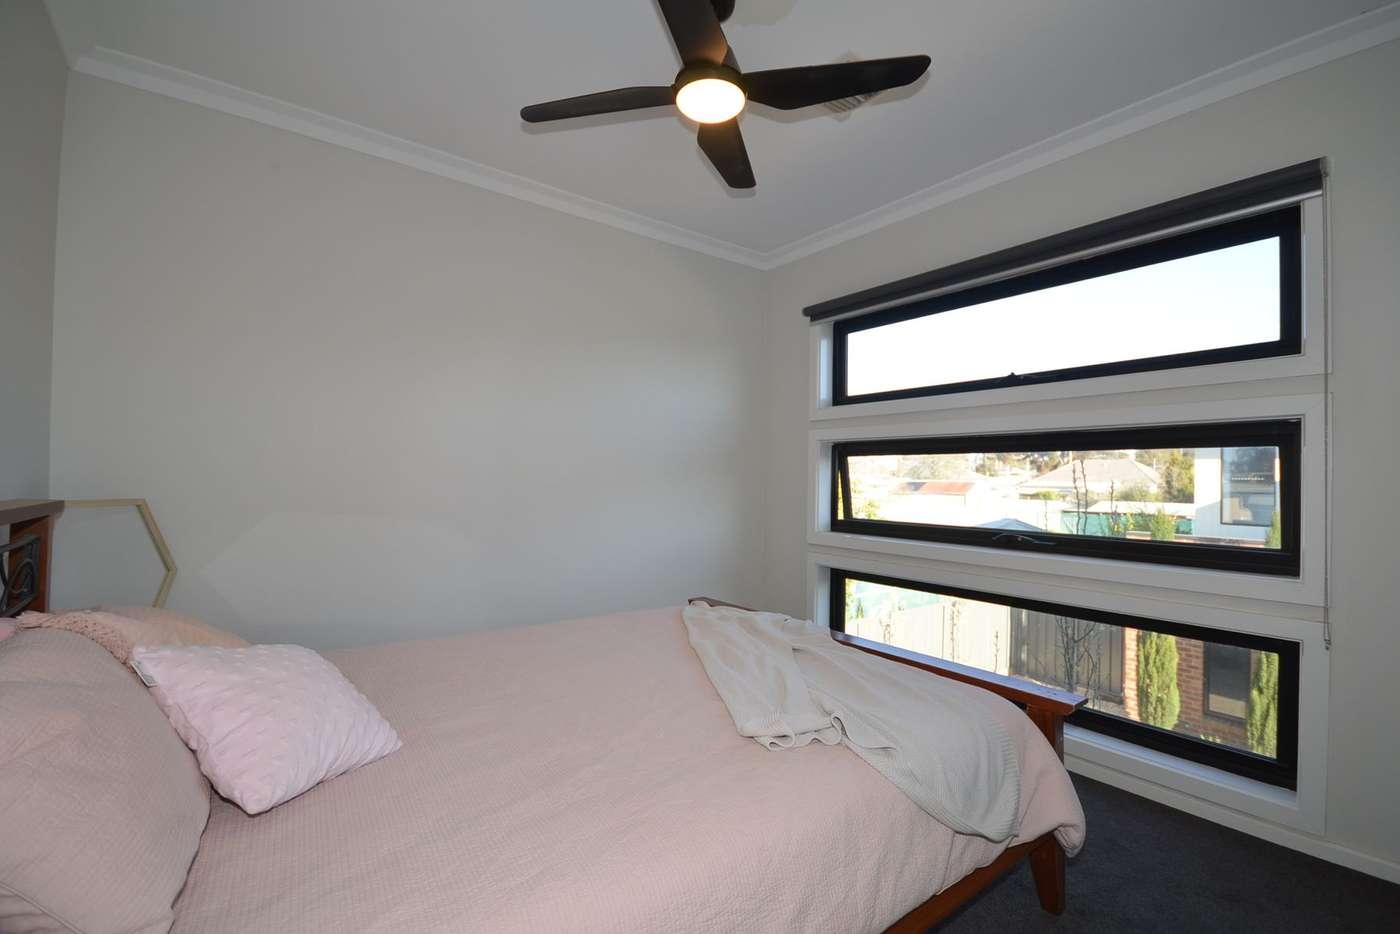 Seventh view of Homely house listing, 3/35 Sternberg Street, Kennington VIC 3550